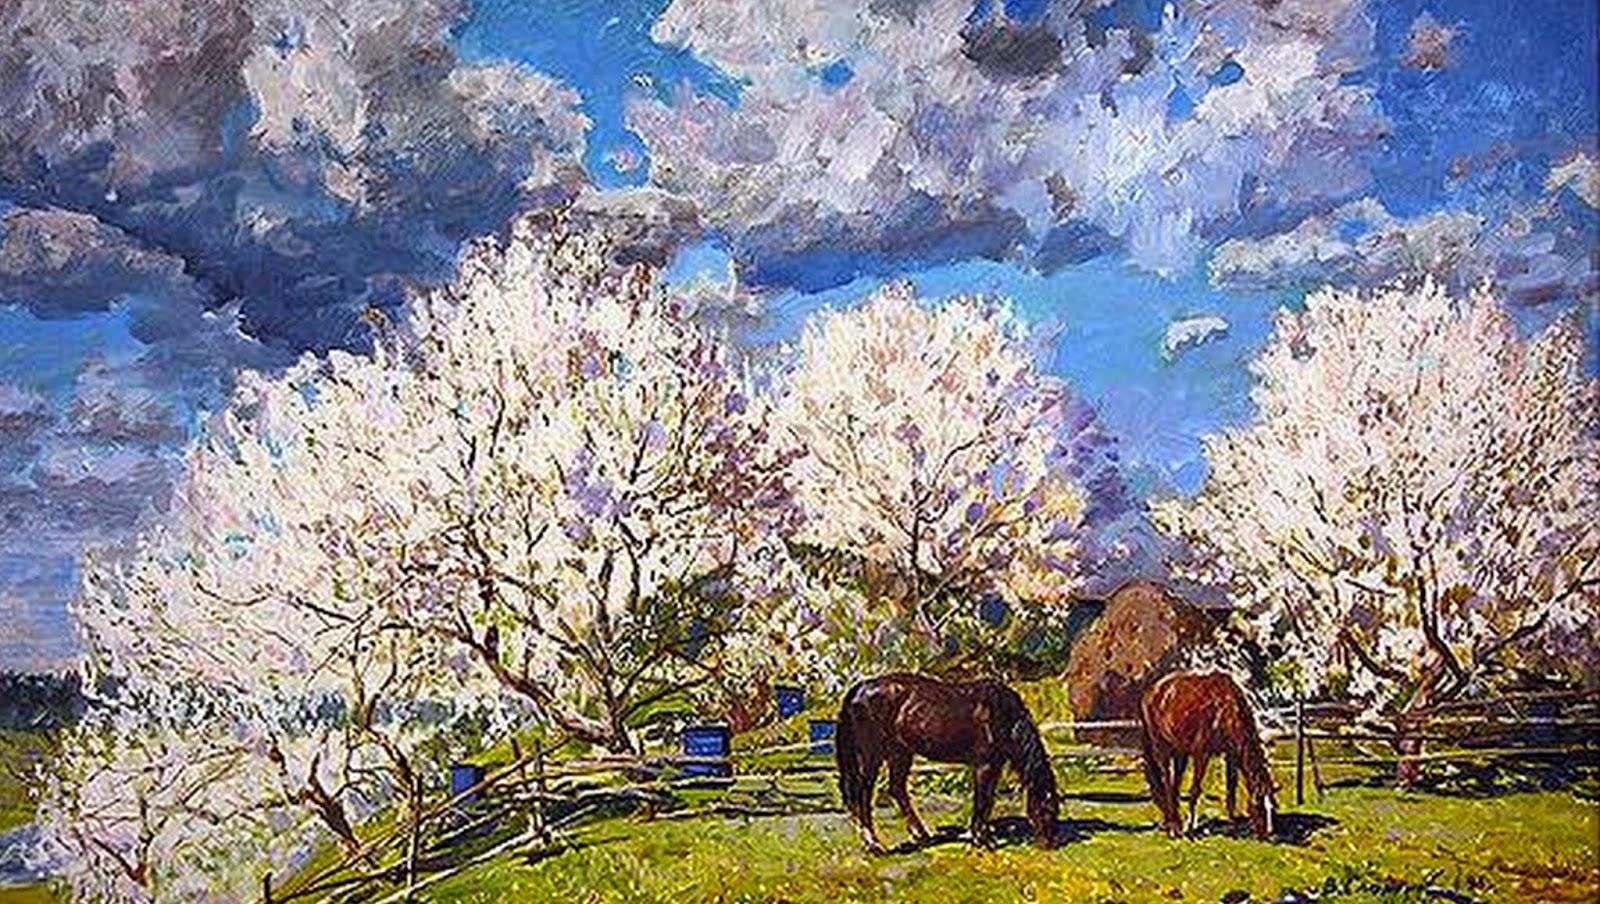 cuadros-pinturas-al-oleo-paisajes